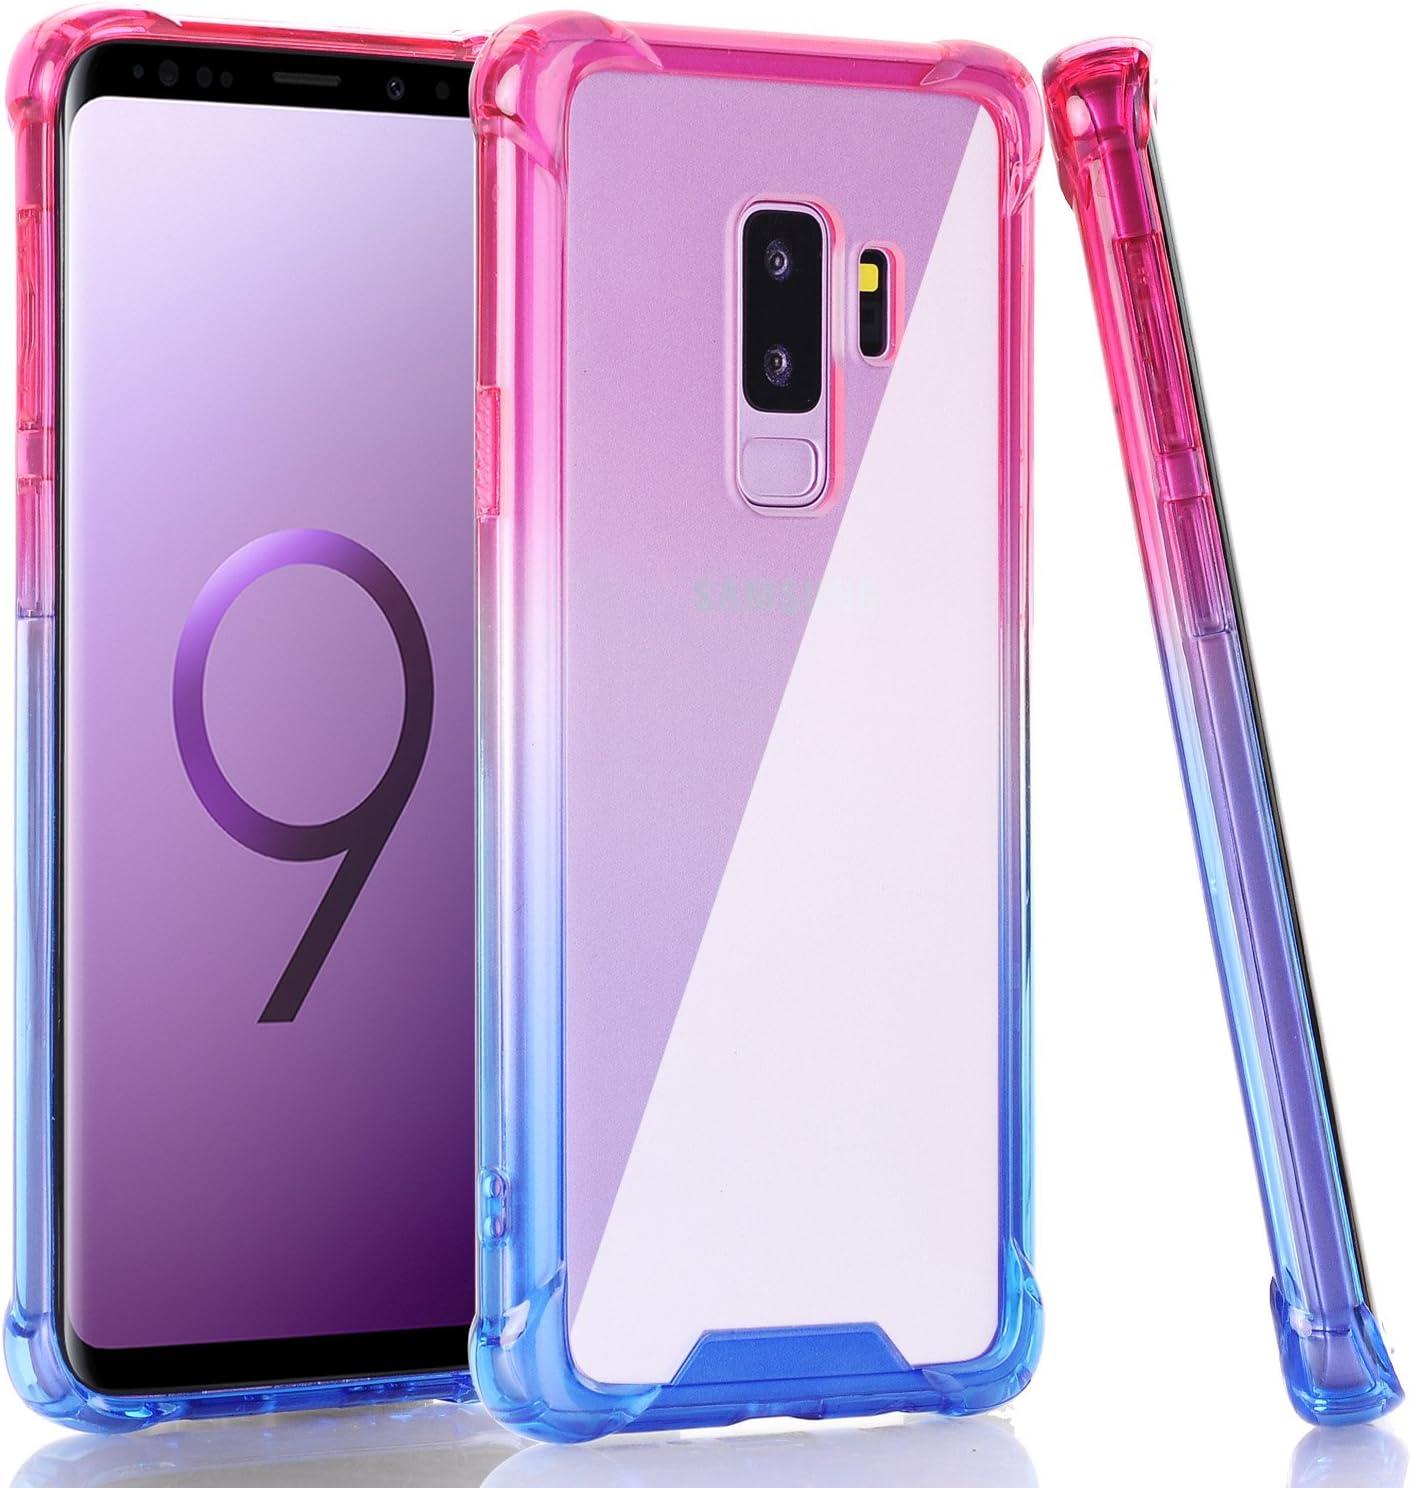 BAISRKE Galaxy S9 Plus Case, Shock Absorption Flexible TPU Soft Edge Bumper Anti-Scratch Rigid Slim Protective Cases Hard Plastic Back Cover for Samsung Galaxy S9+ Plus - Pink Blue Gradient